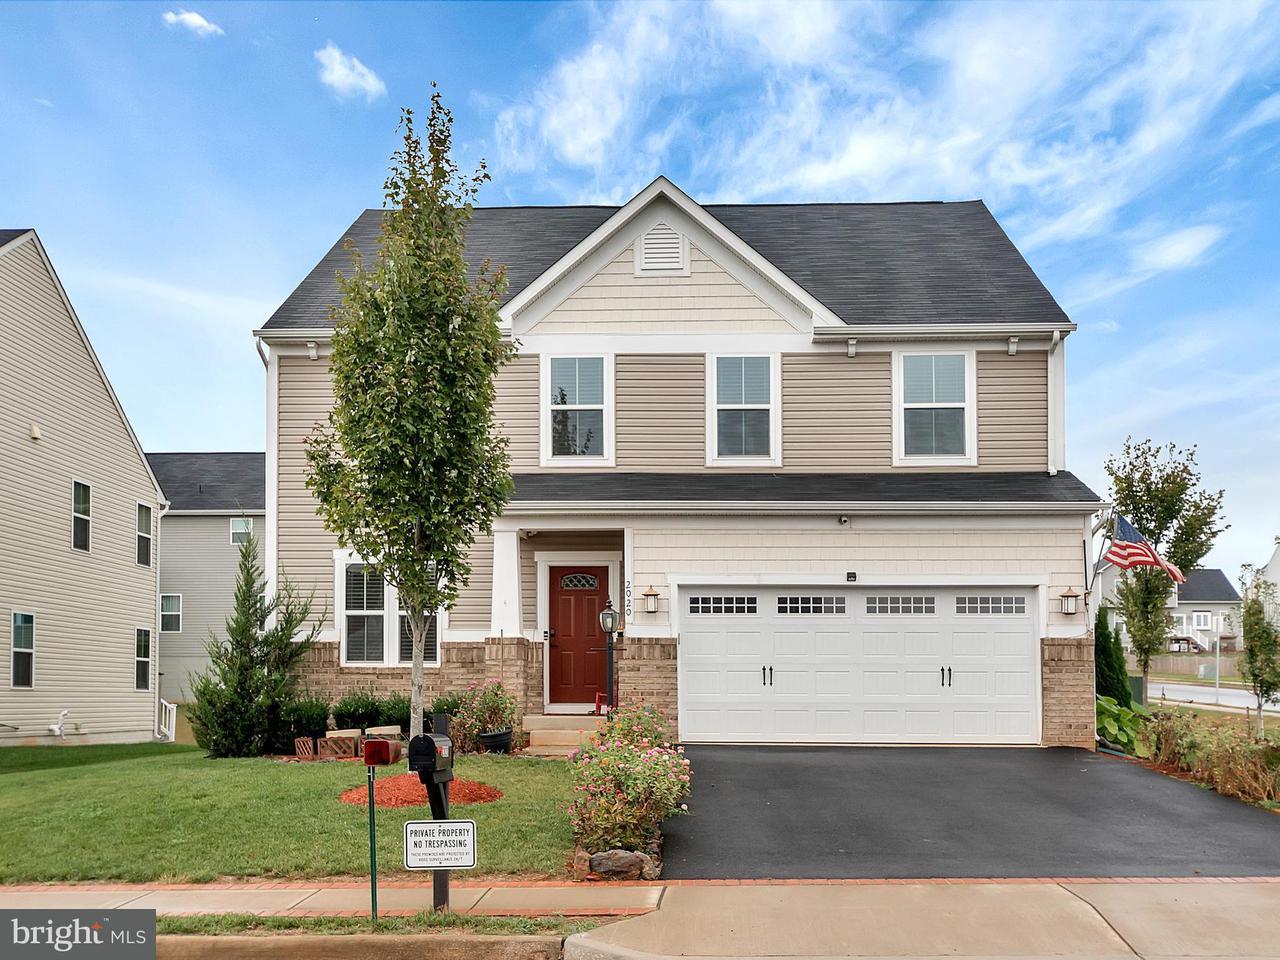 Single Family for Sale at 2020 Magnolia Cir W Culpeper, Virginia 22701 United States